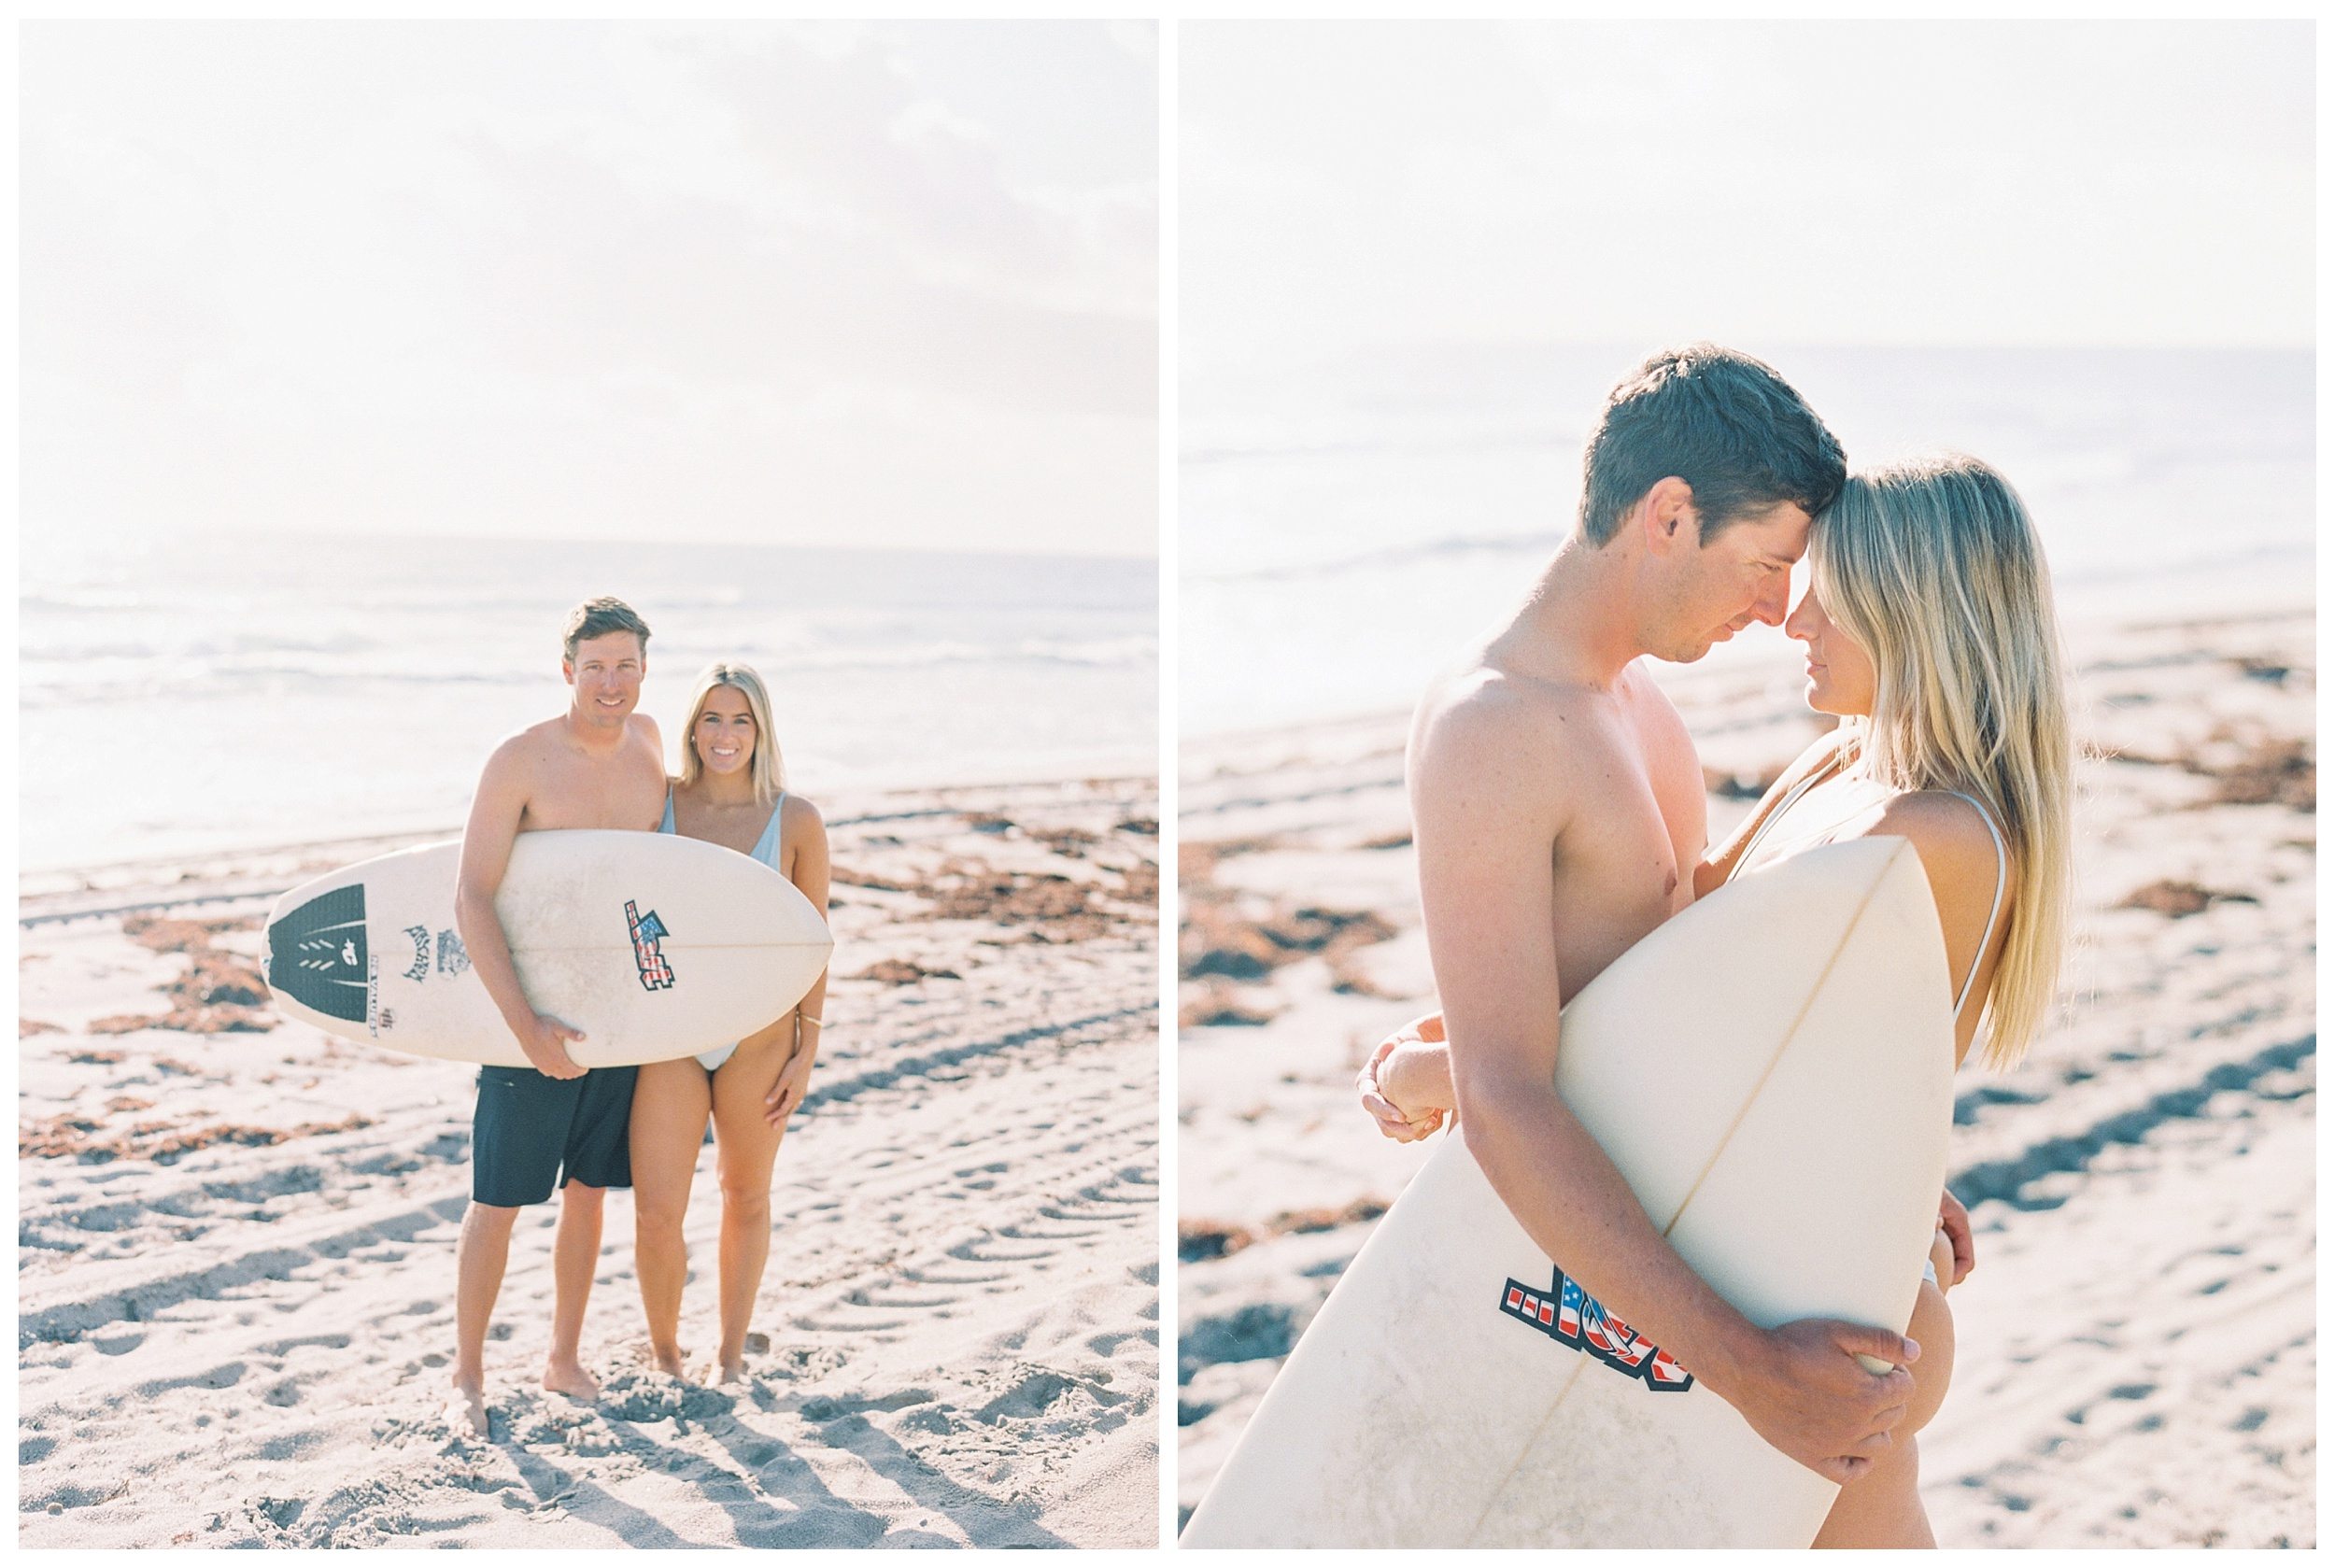 Surfboard Engagement Florida Wedding Photographer Kir Tuben_0012.jpg